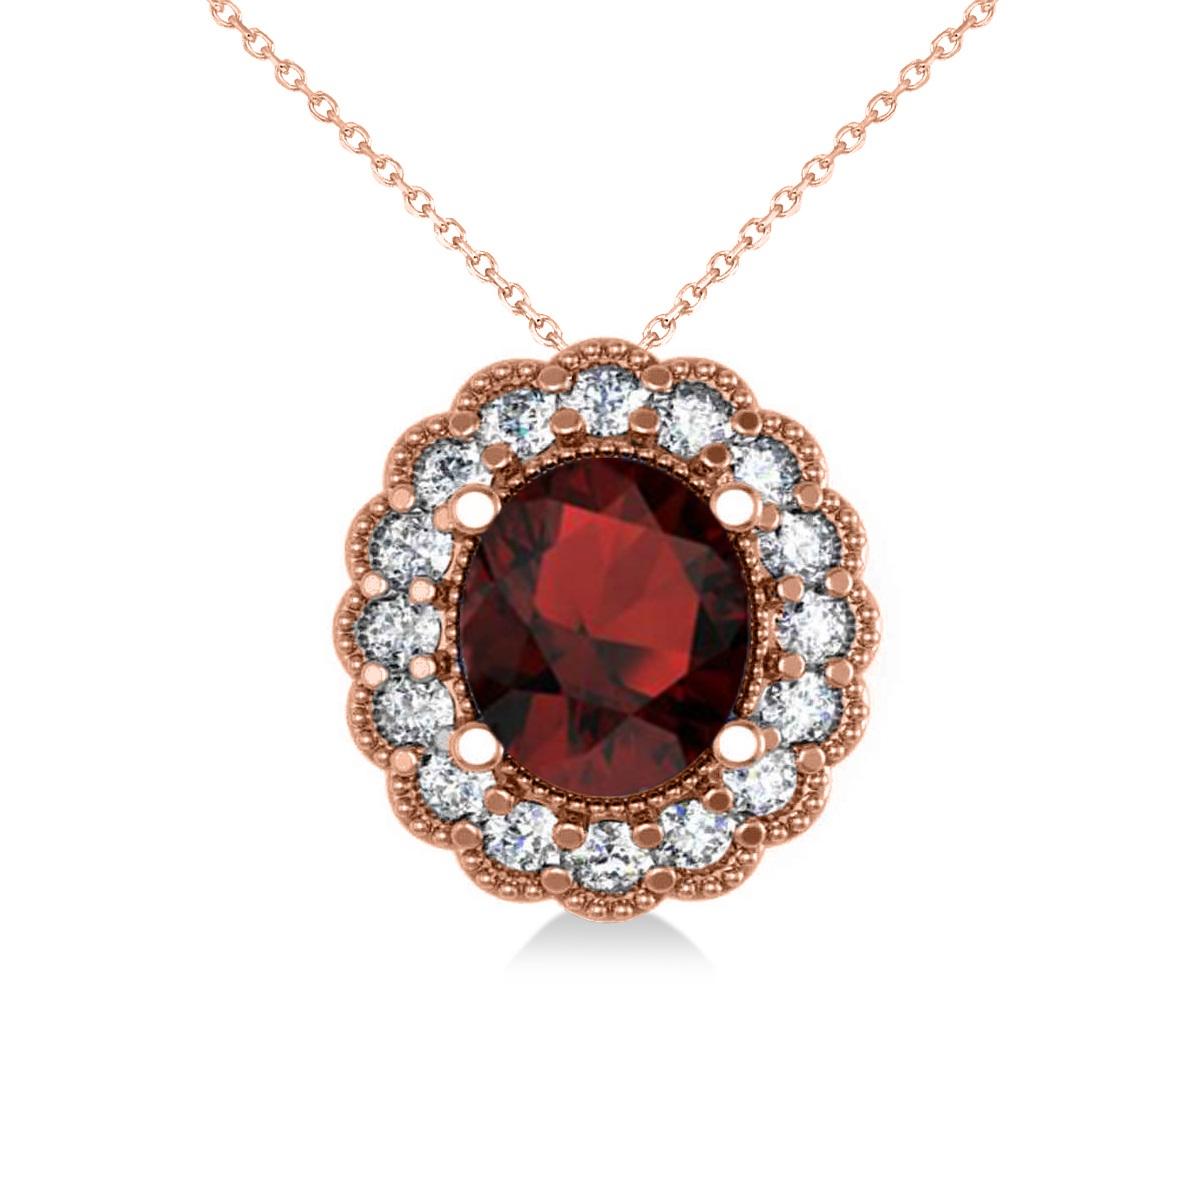 Garnet & Diamond Floral Oval Pendant Necklace 14k Rose Gold (2.98ct)